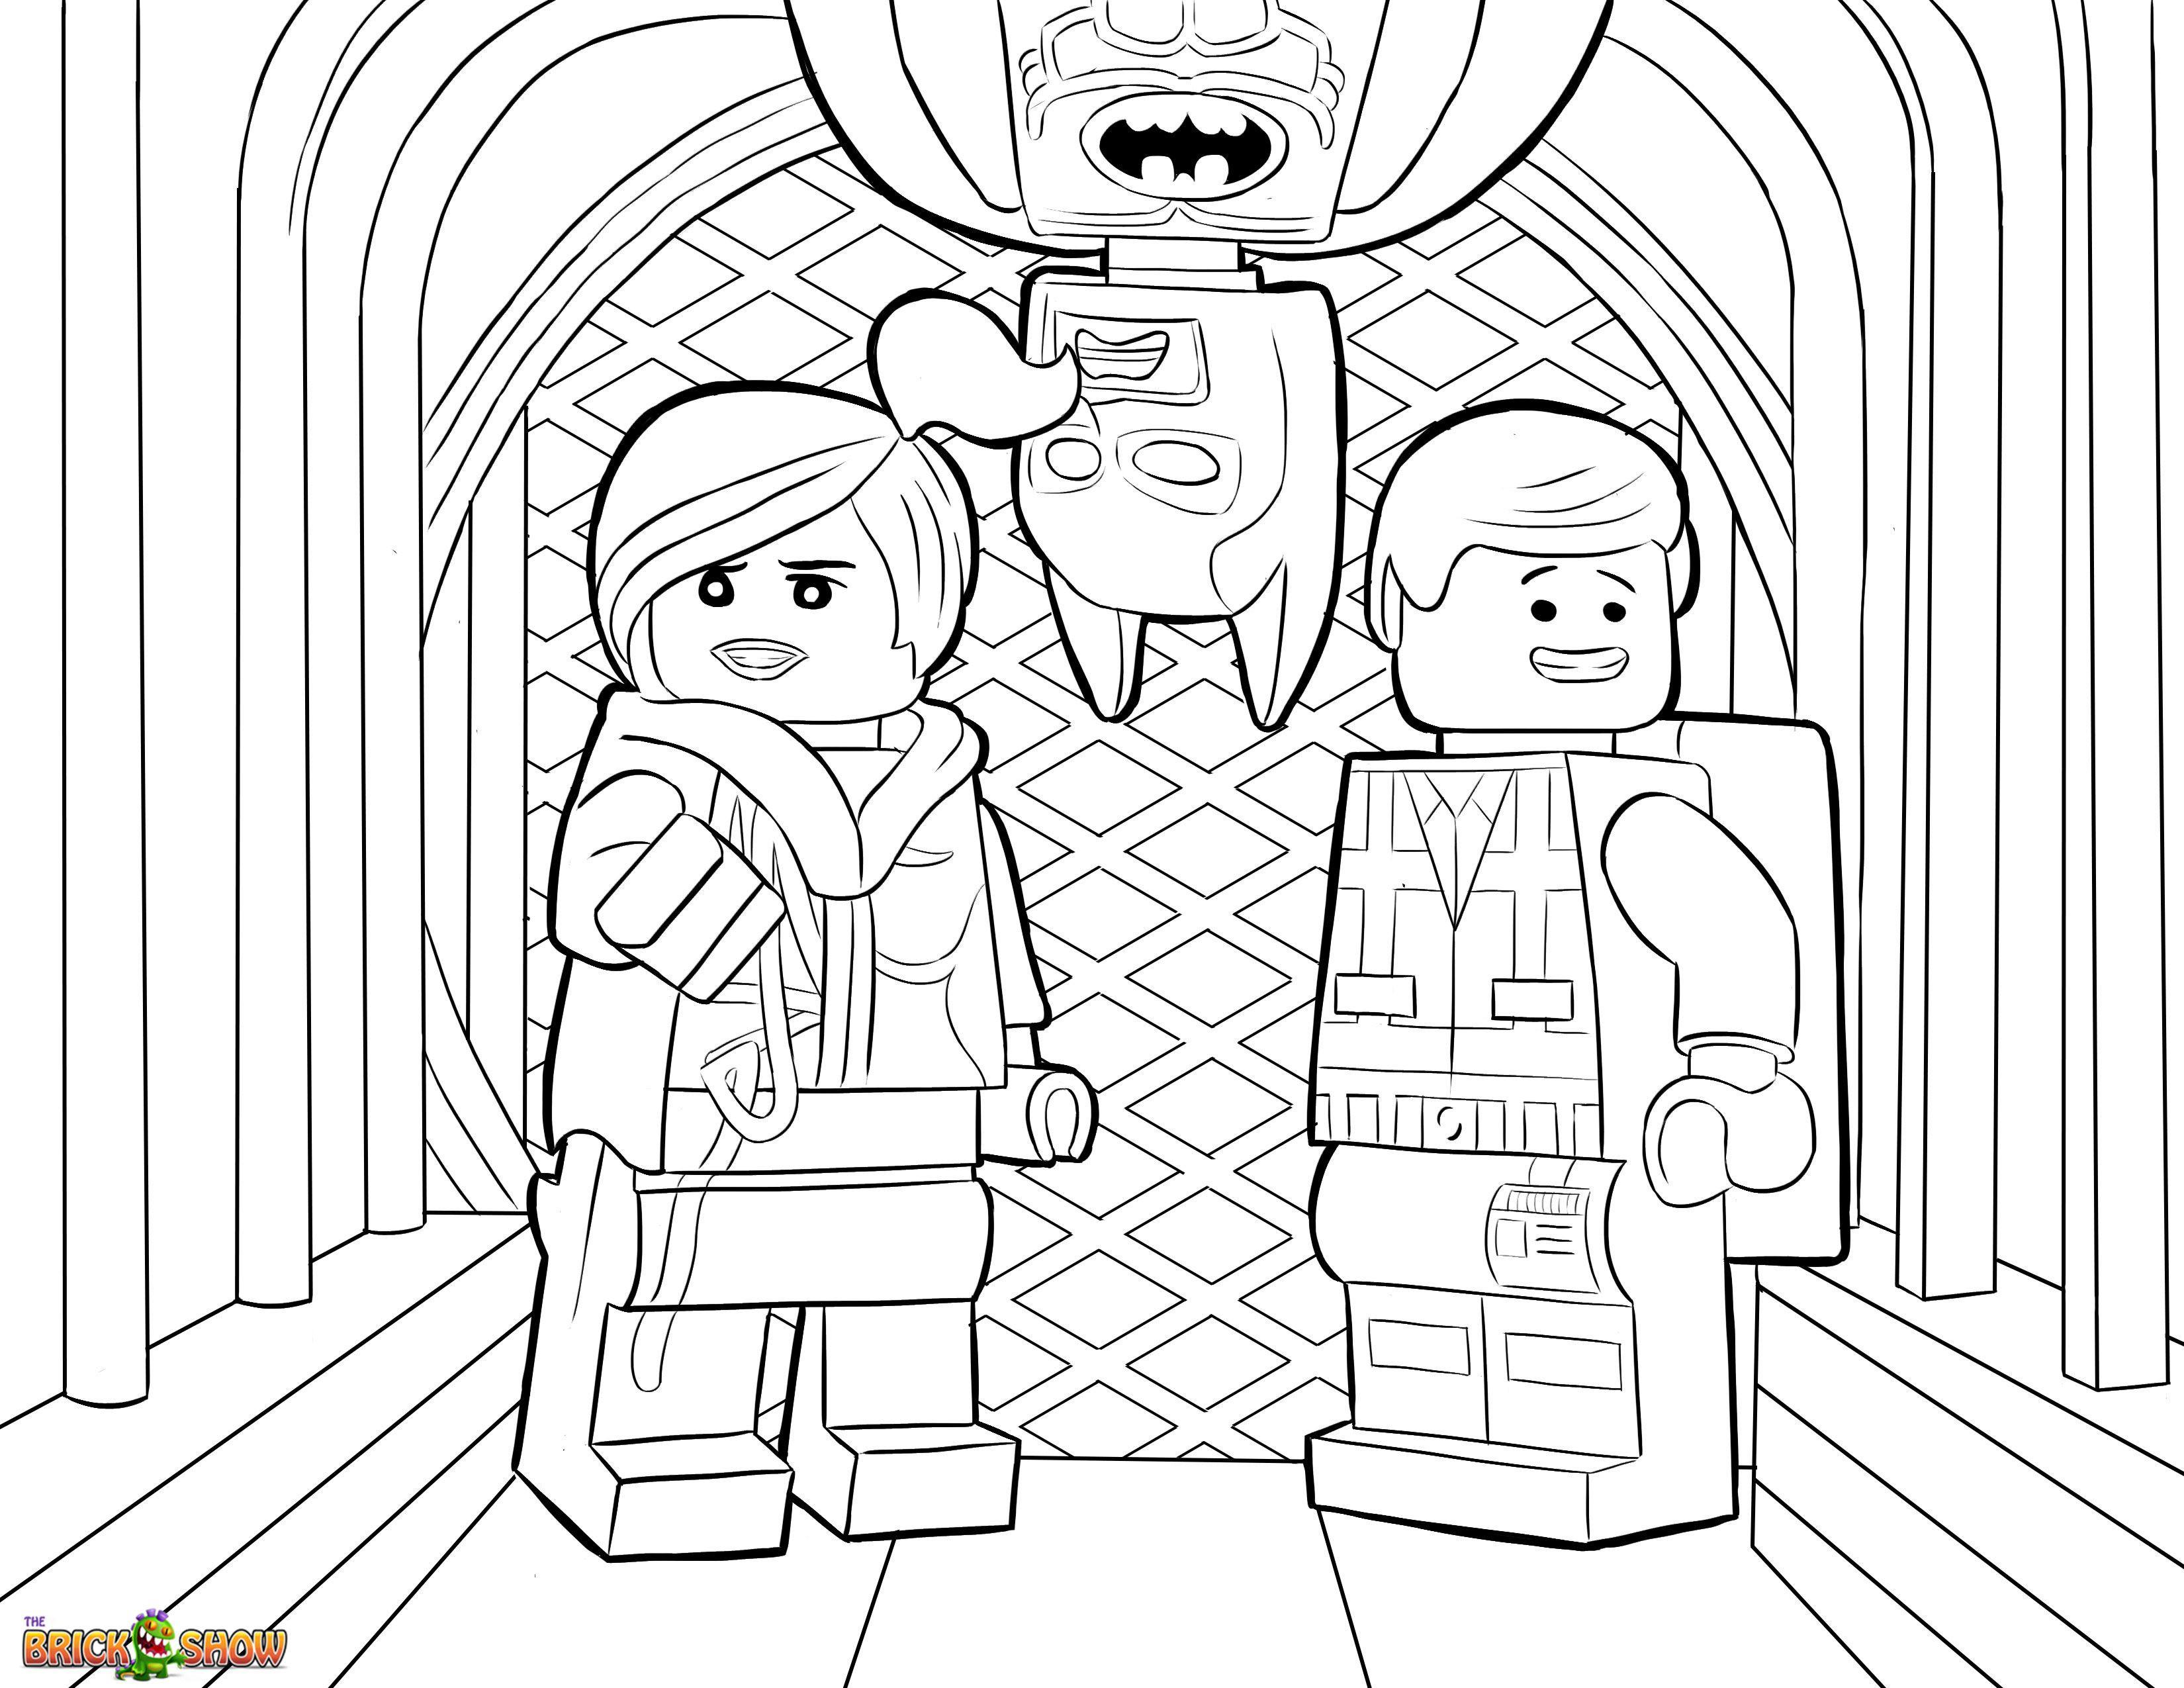 Ausmalbilder Batman Lego Frisch the Lego Movie Coloring Page Lego Wyldstyle Emmet & Batman Genial Das Bild